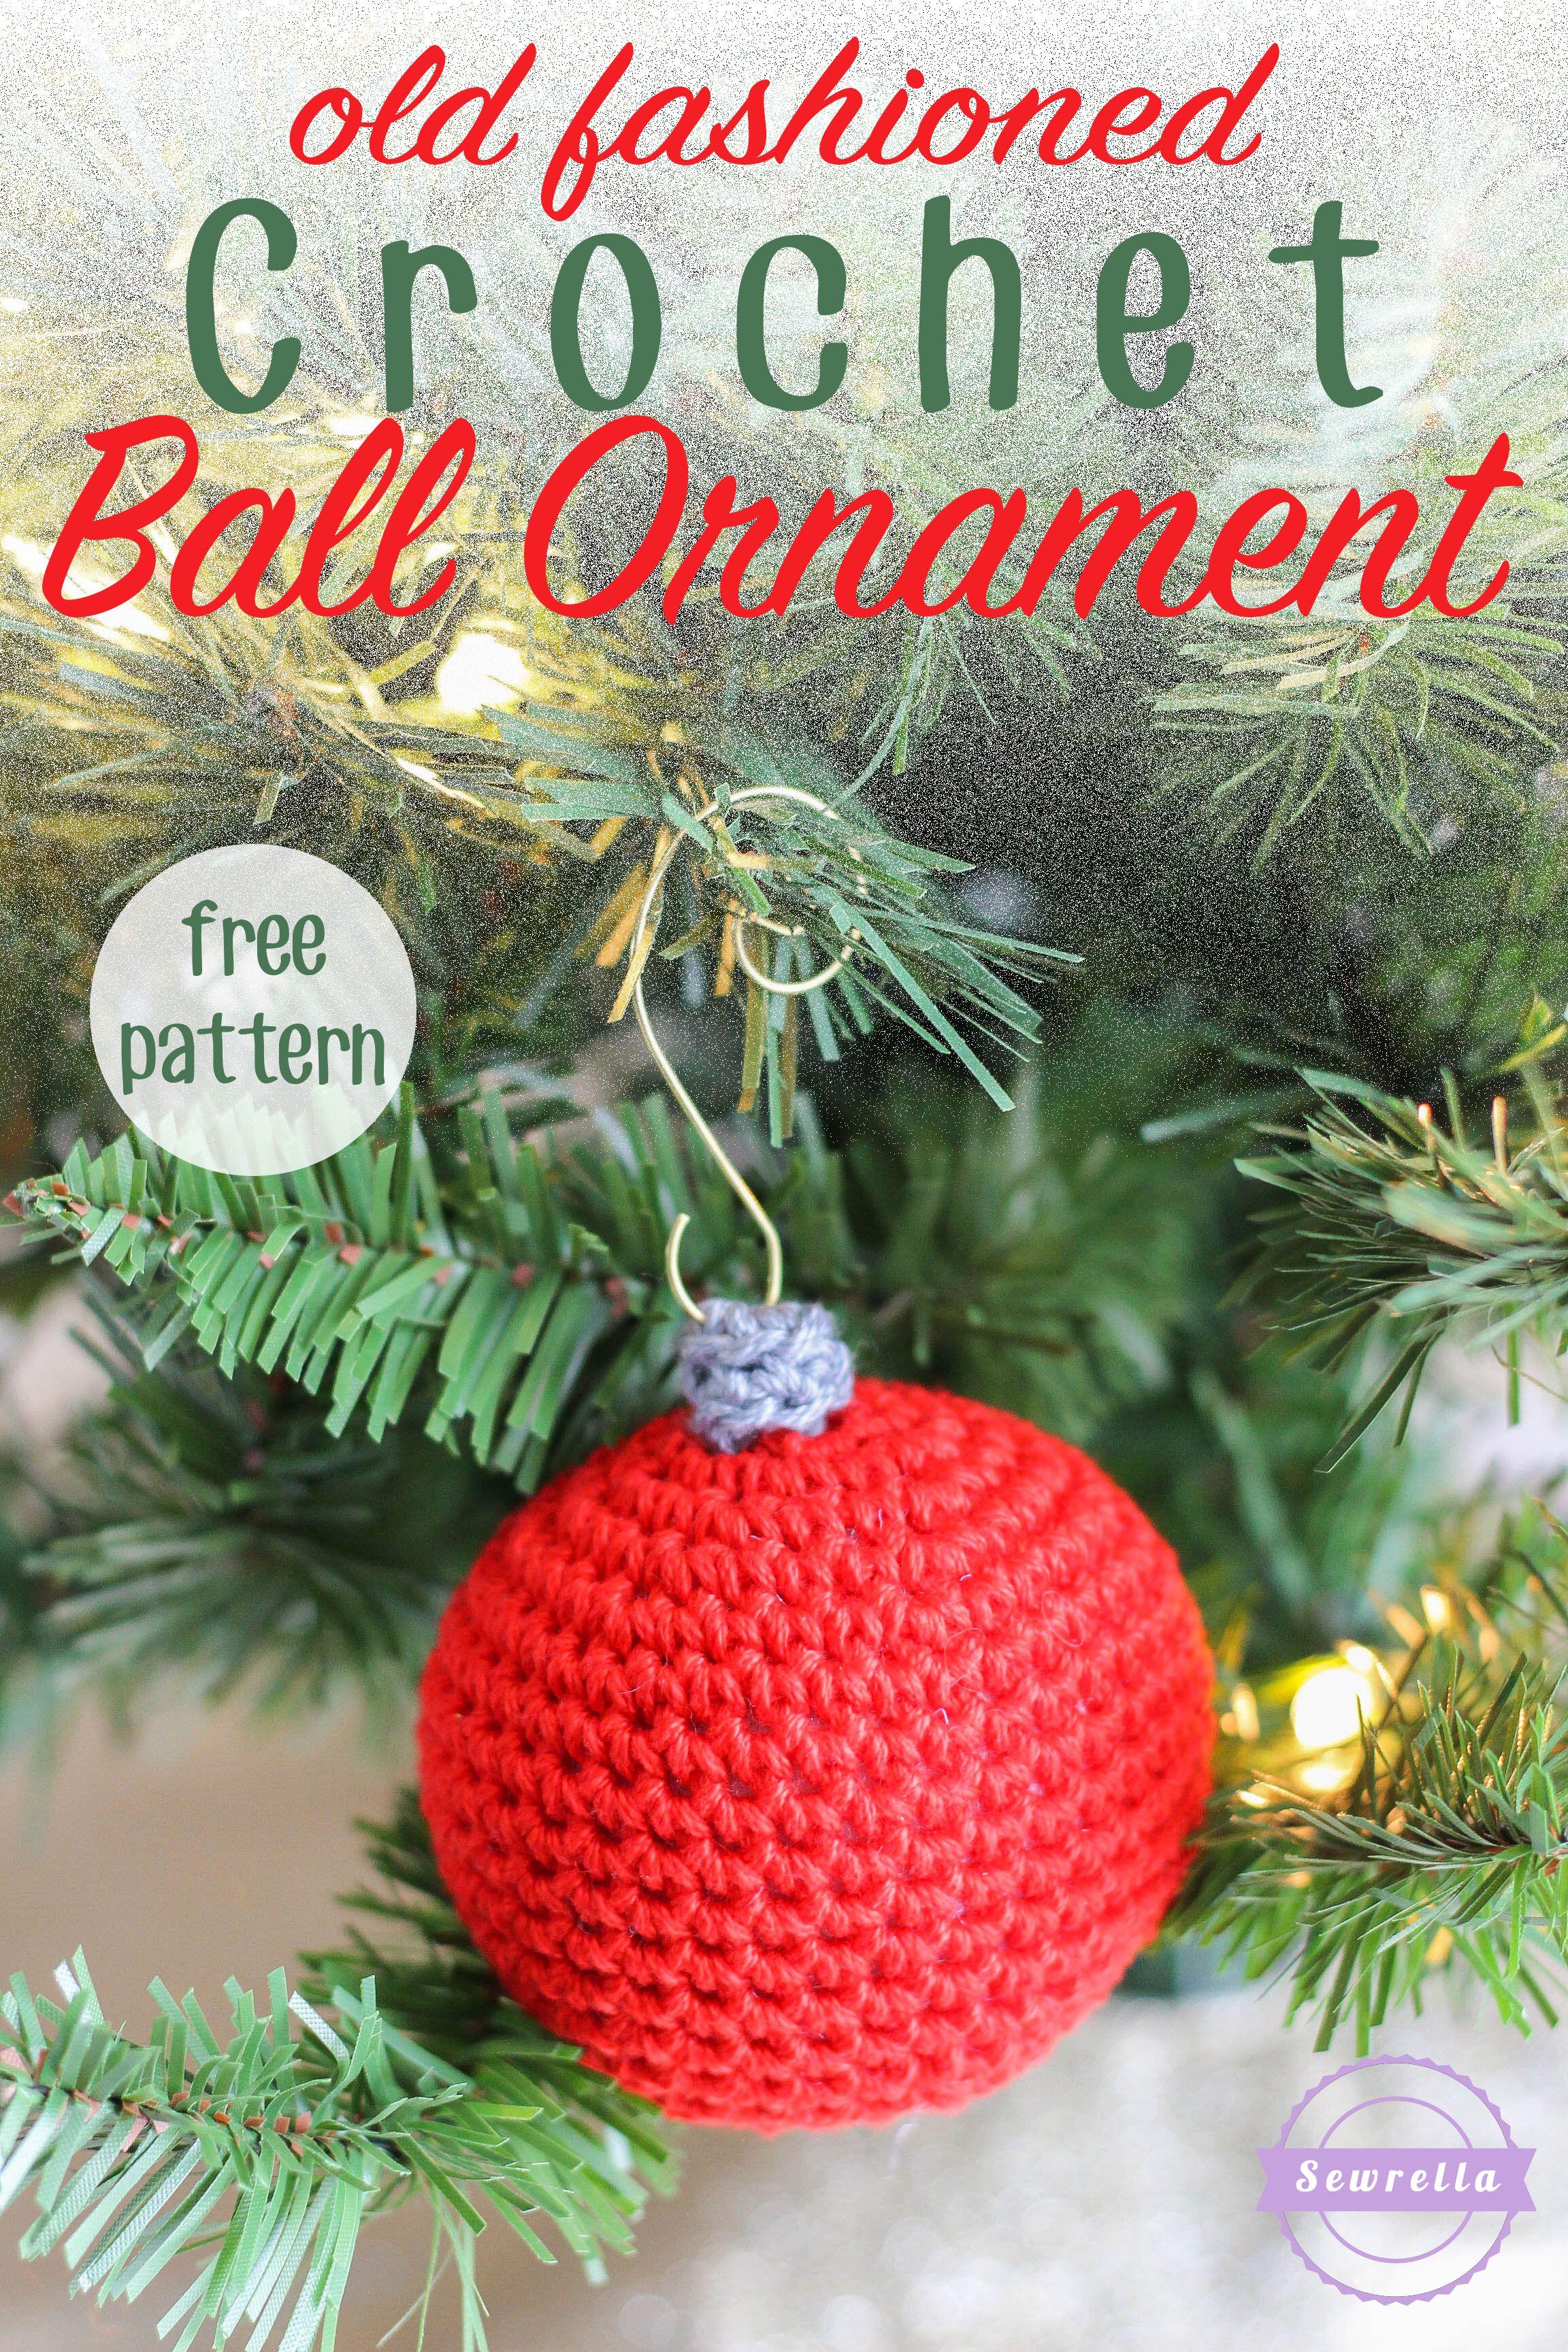 Old Fashioned Crochet Ball Ornament | Sewrella | Pinterest | Crochet ...